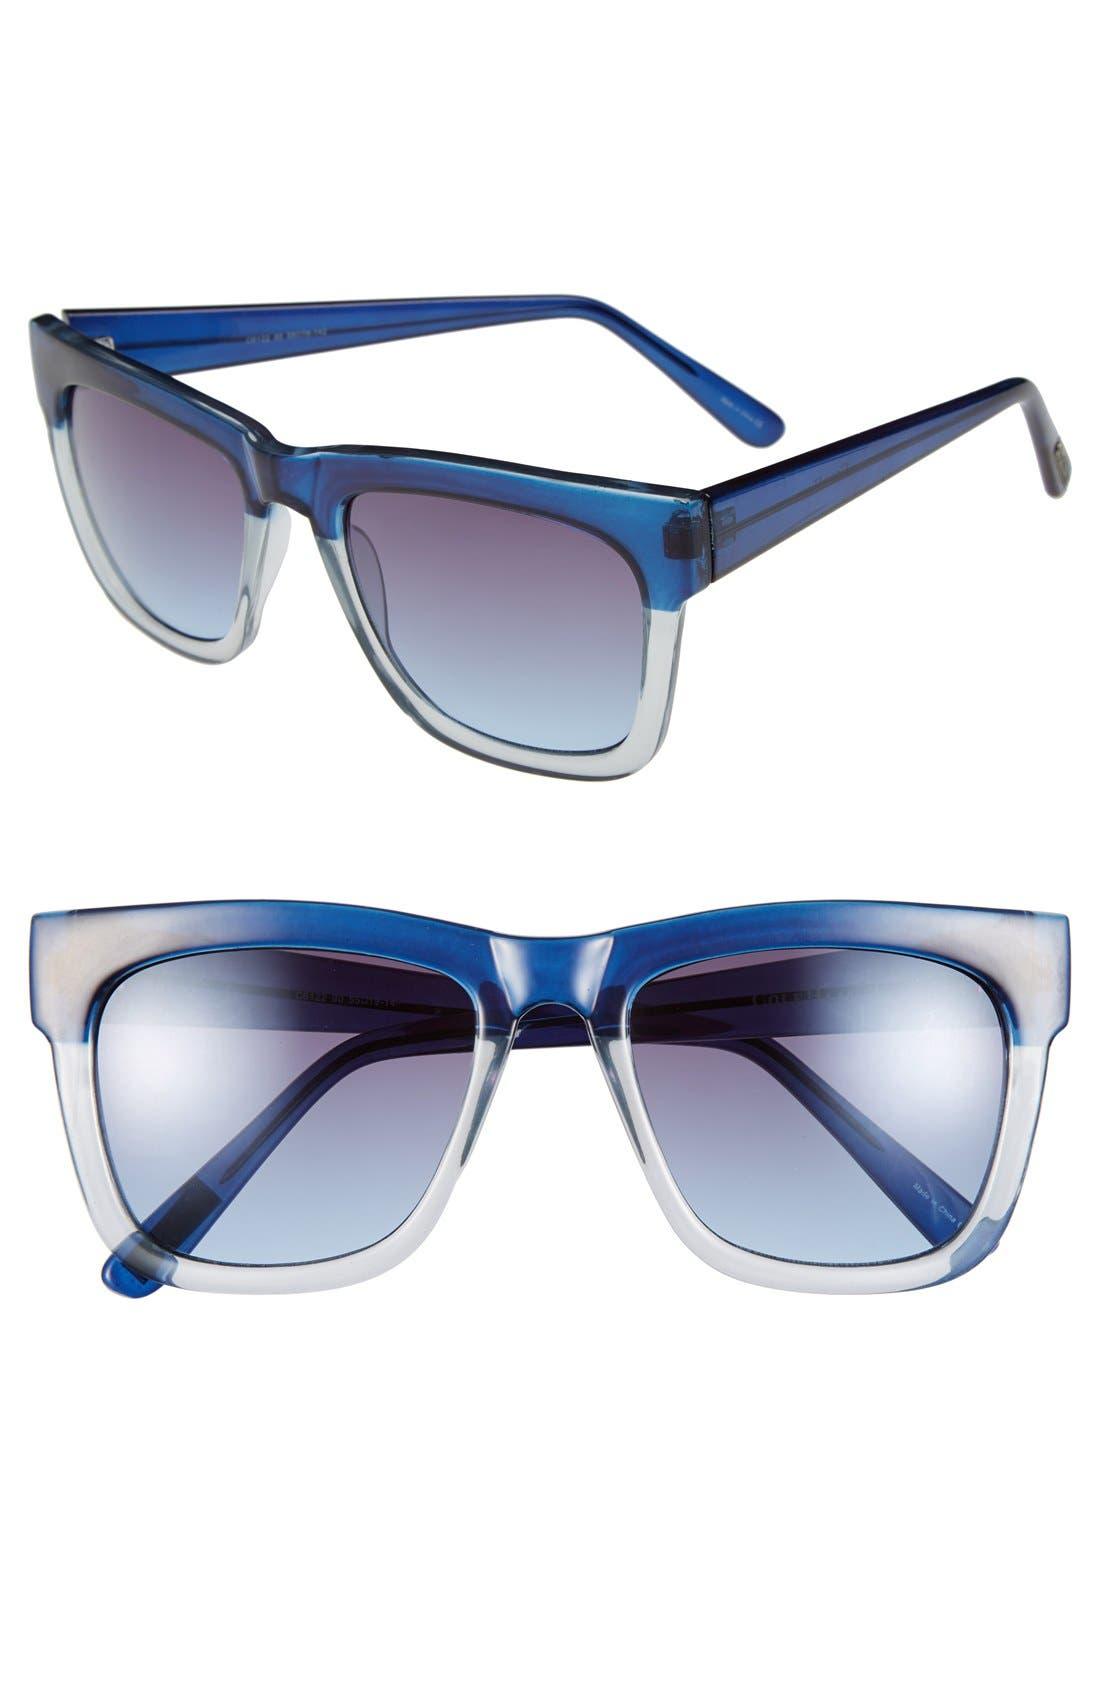 Main Image - Cole Haan 55mm Rectangular Sunglasses